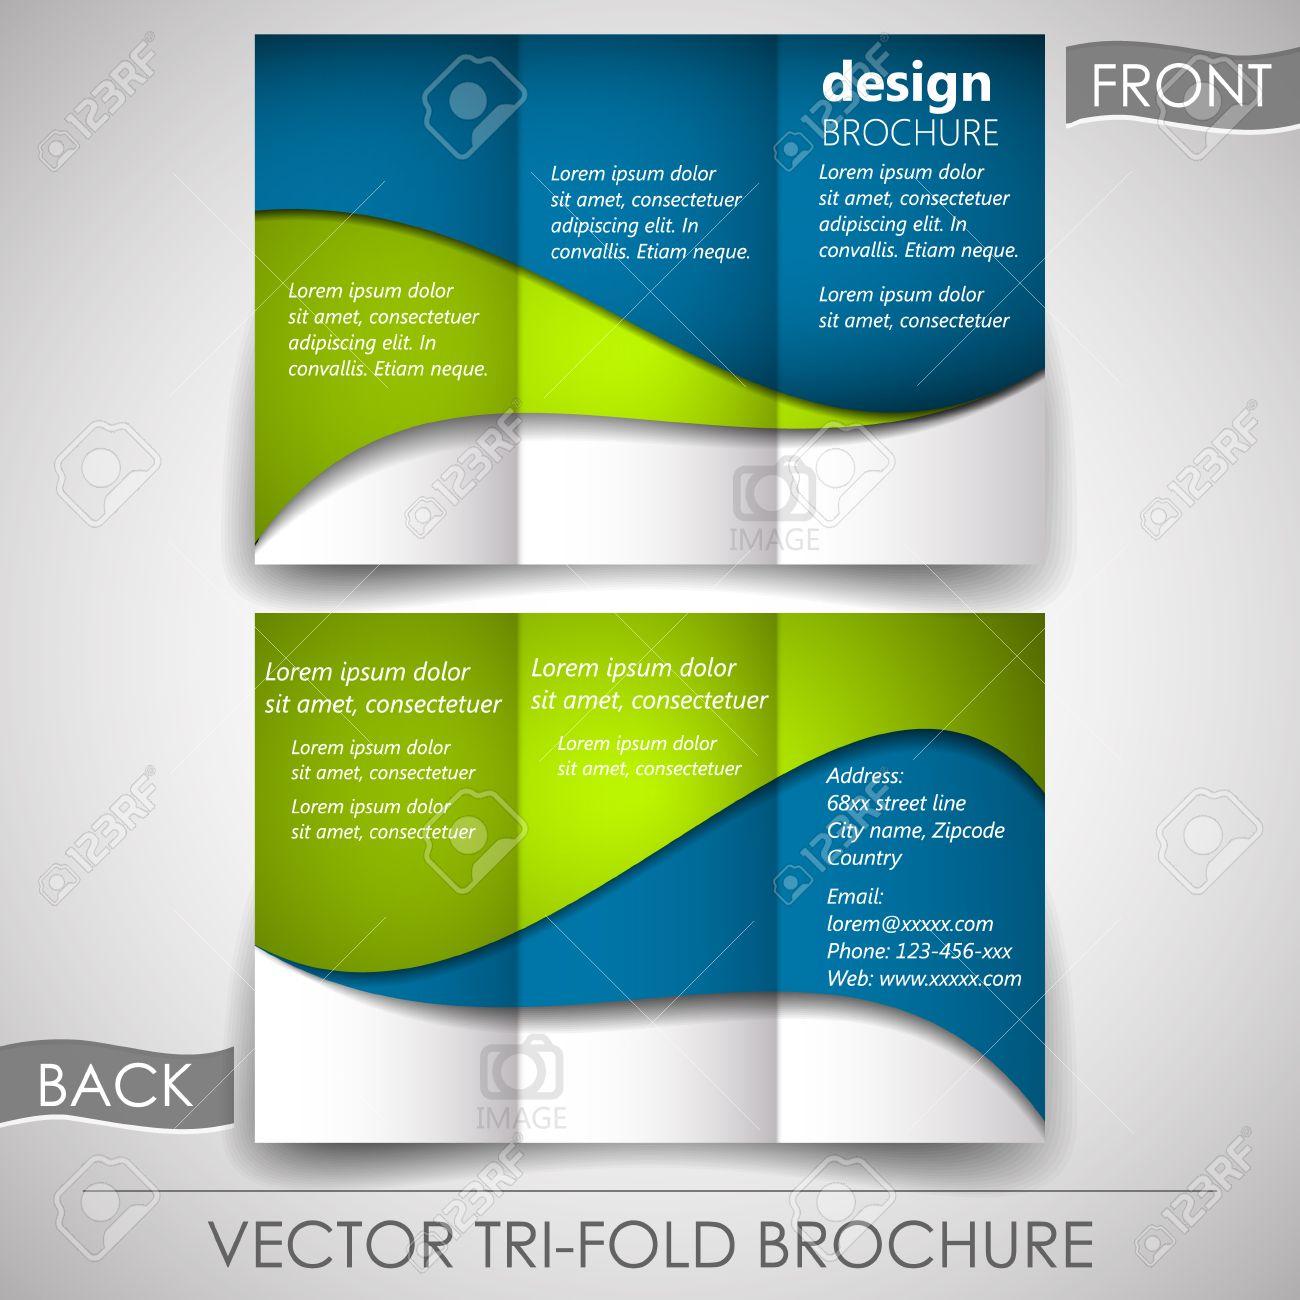 openoffice-vorlagen: professional template pack ii - download ...